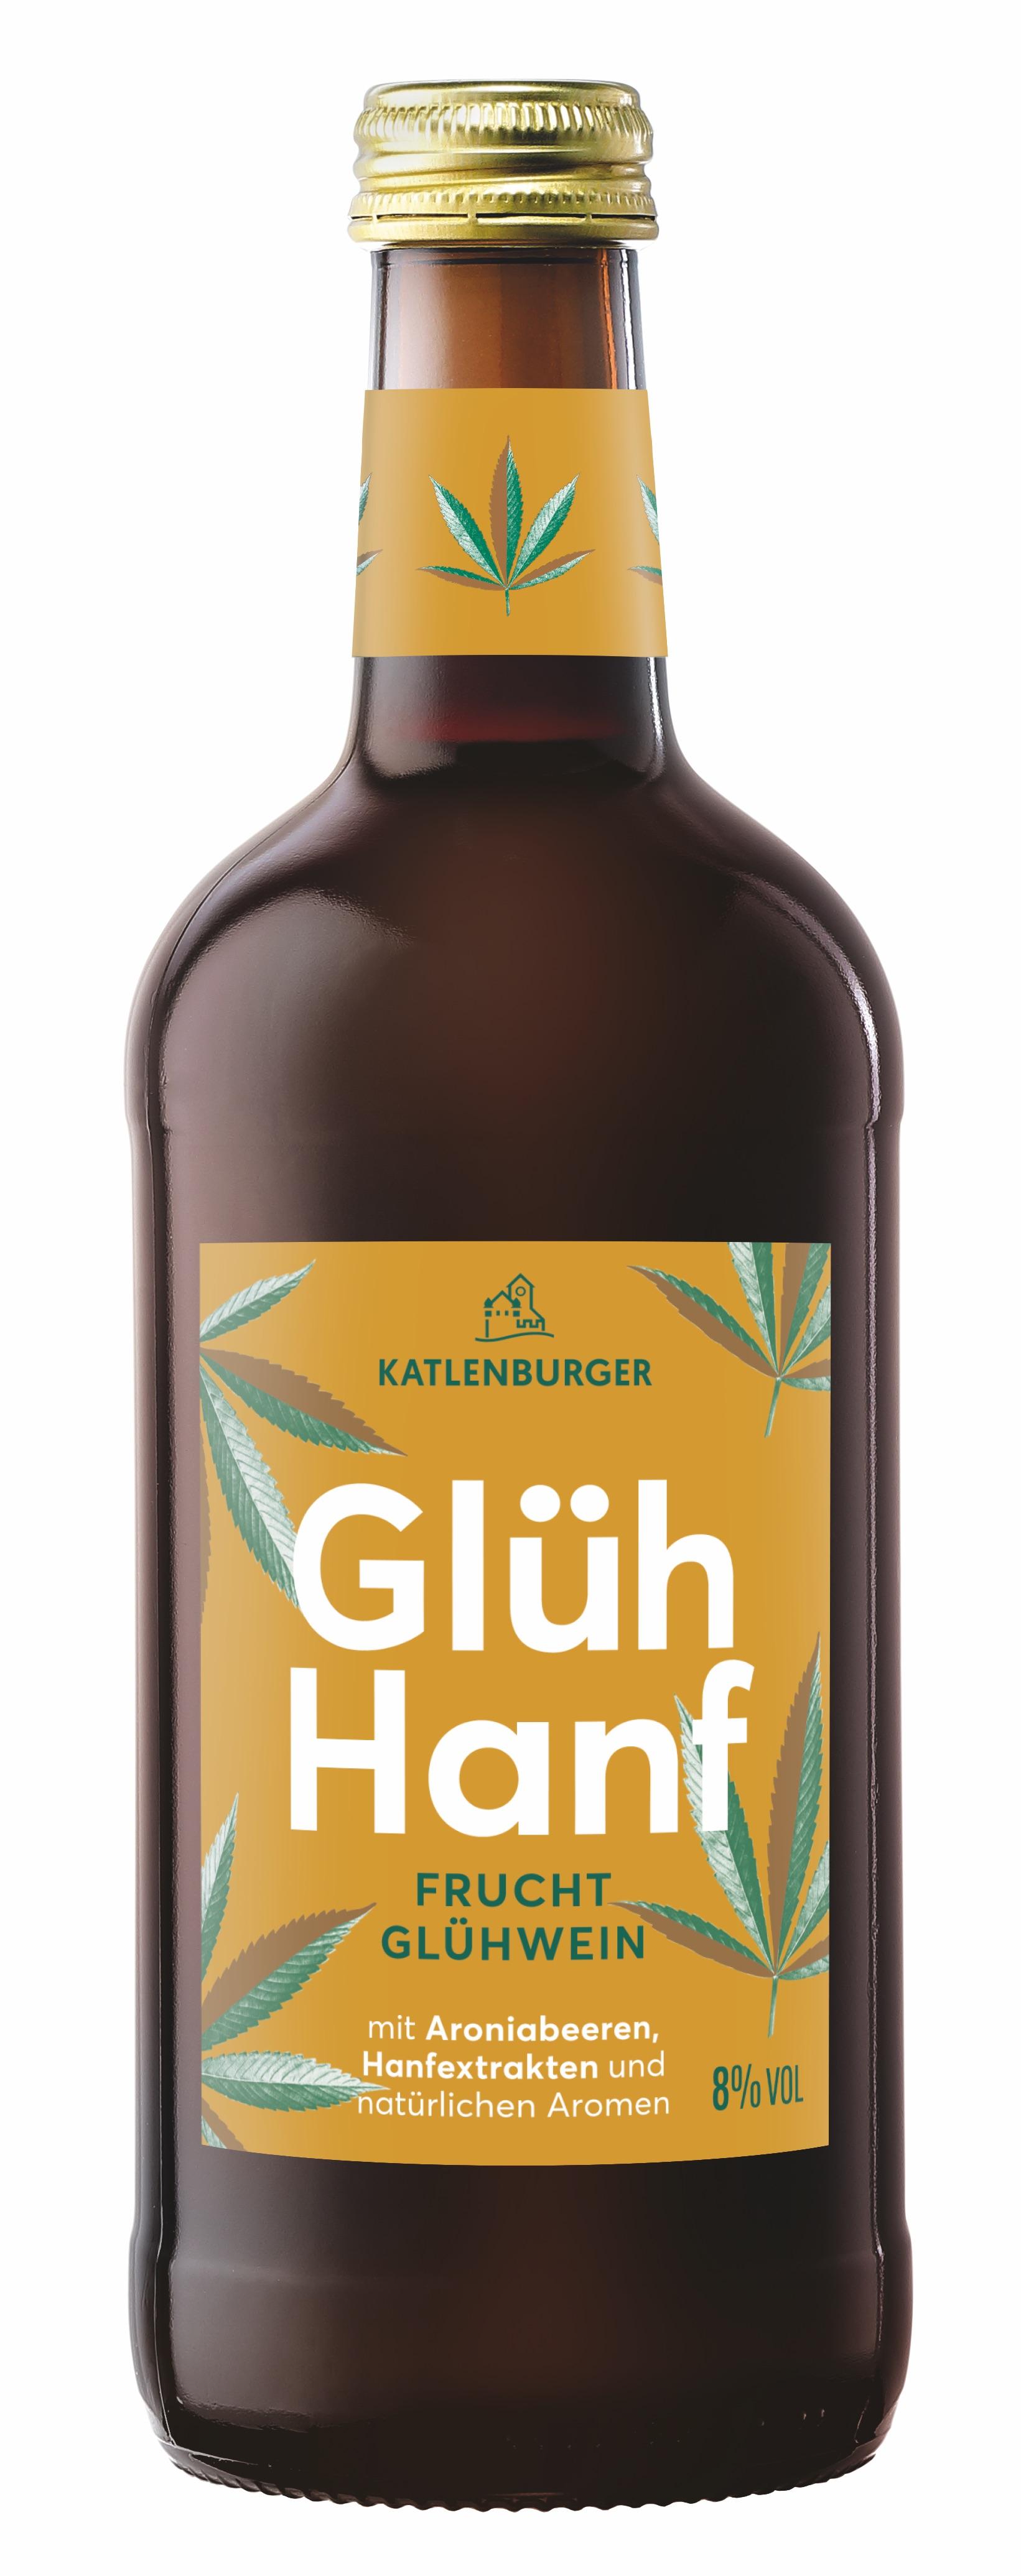 Katlenburger Glüh-Hanf